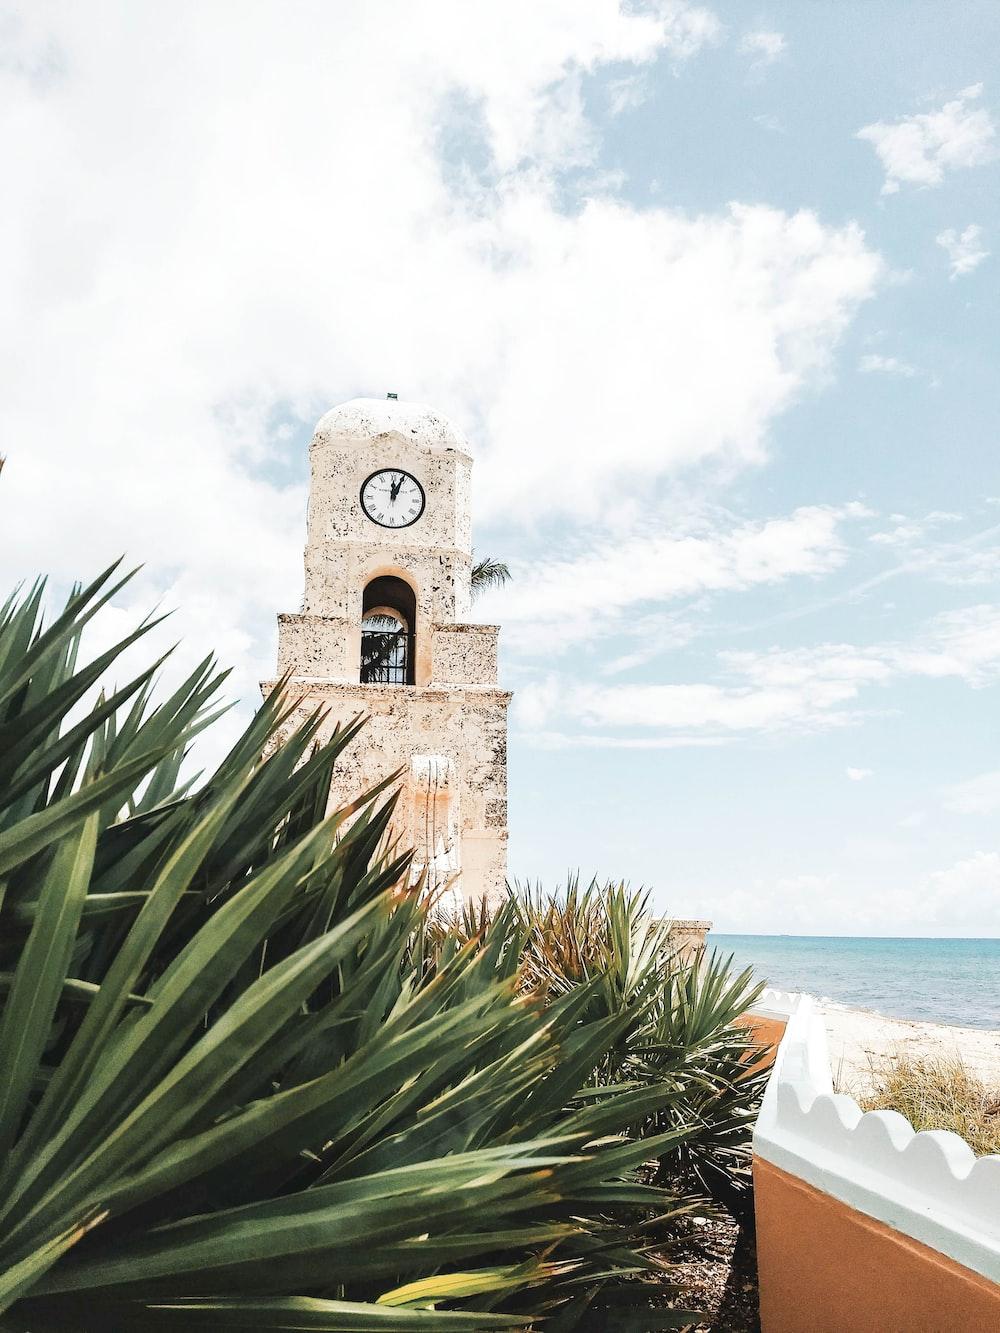 beige stone wall clock tower